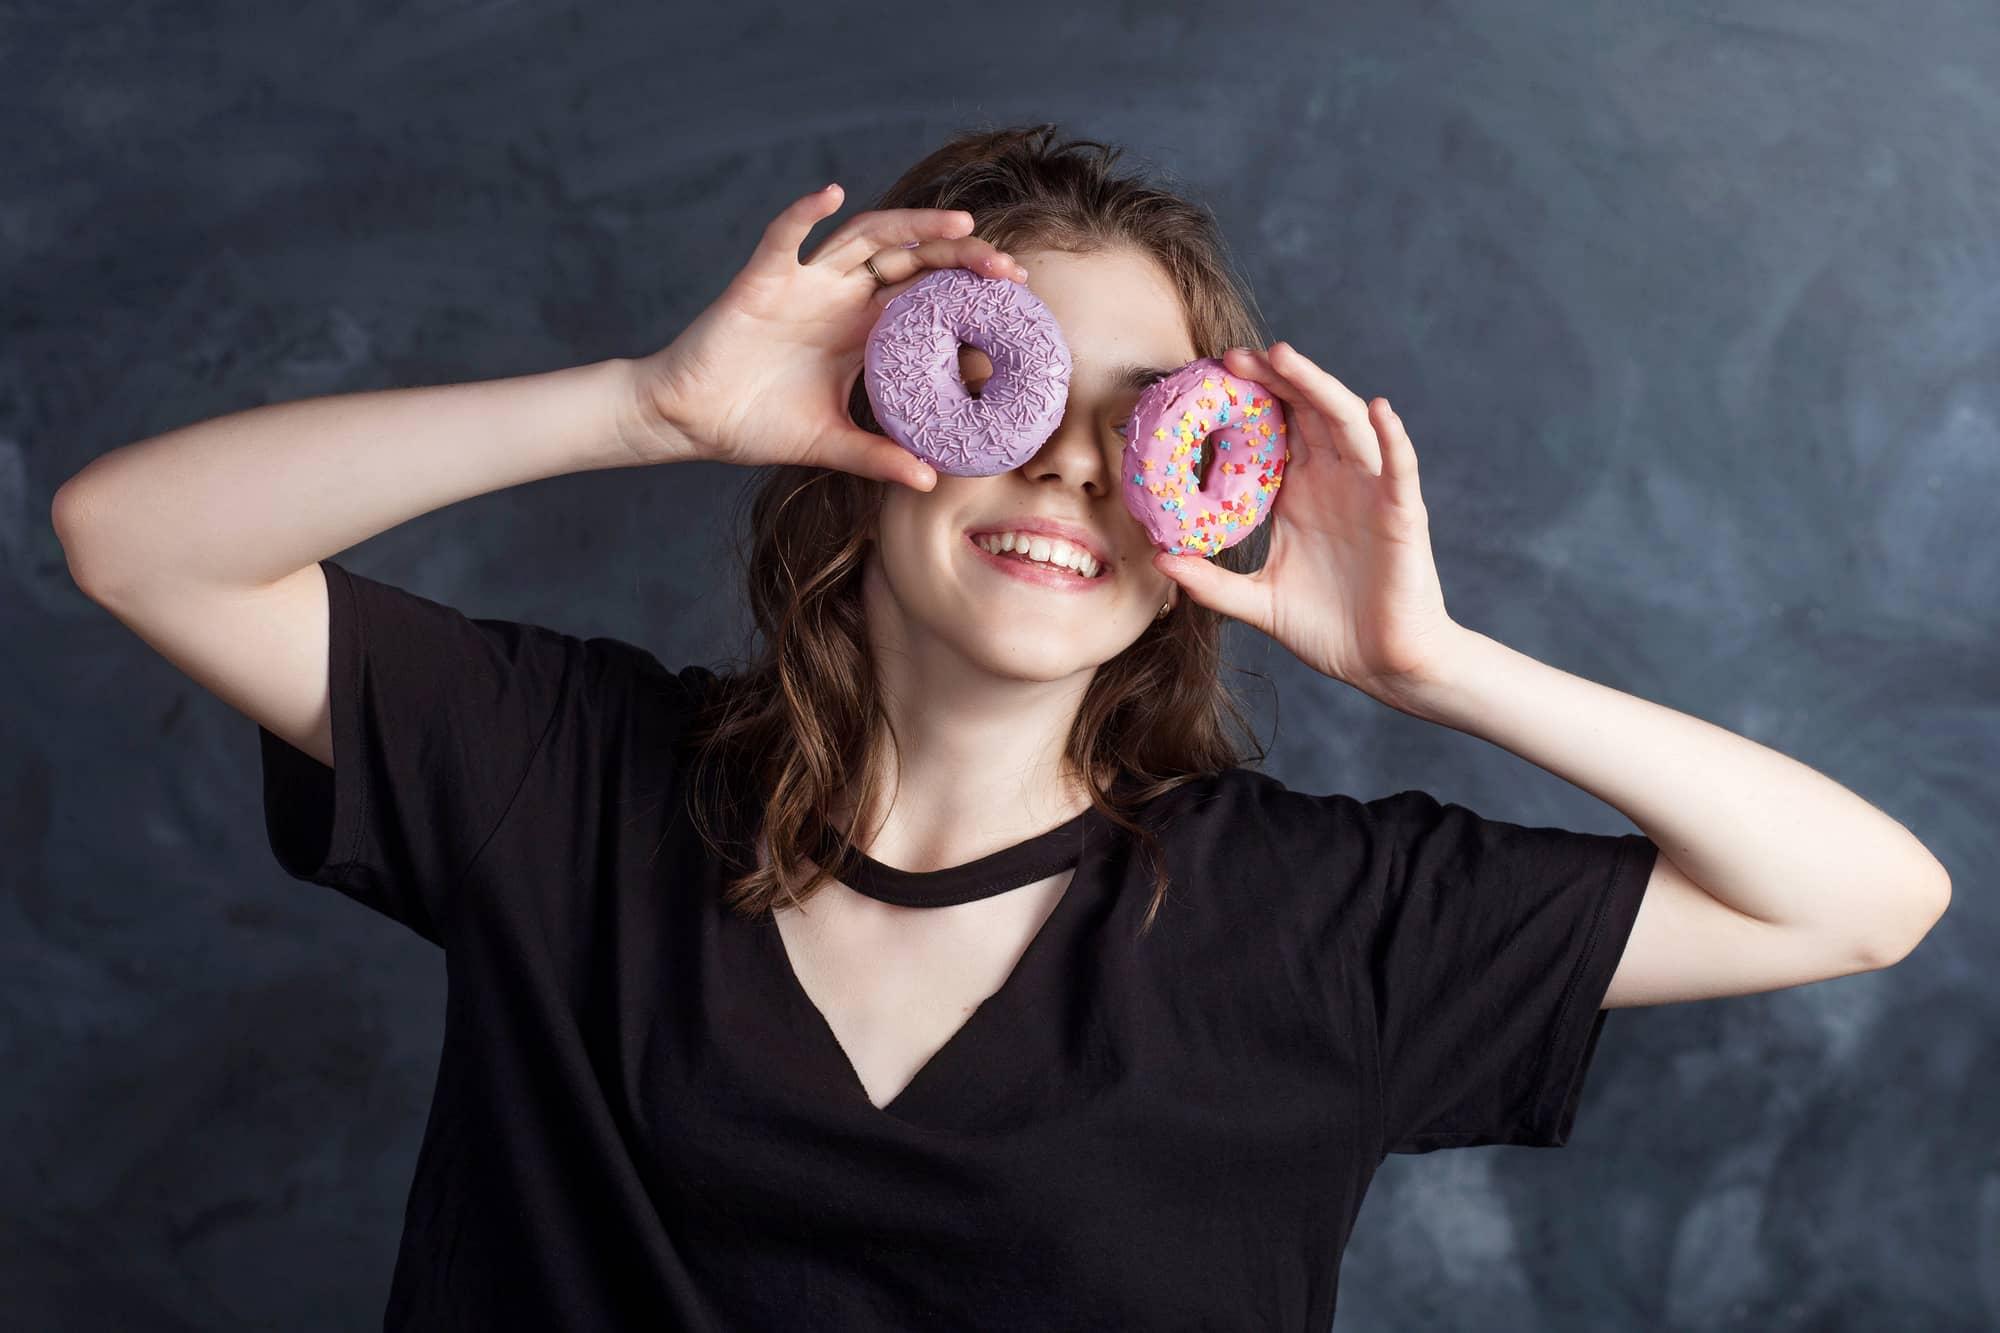 MB EAT, Mindful eating, consapevolezza, cibo